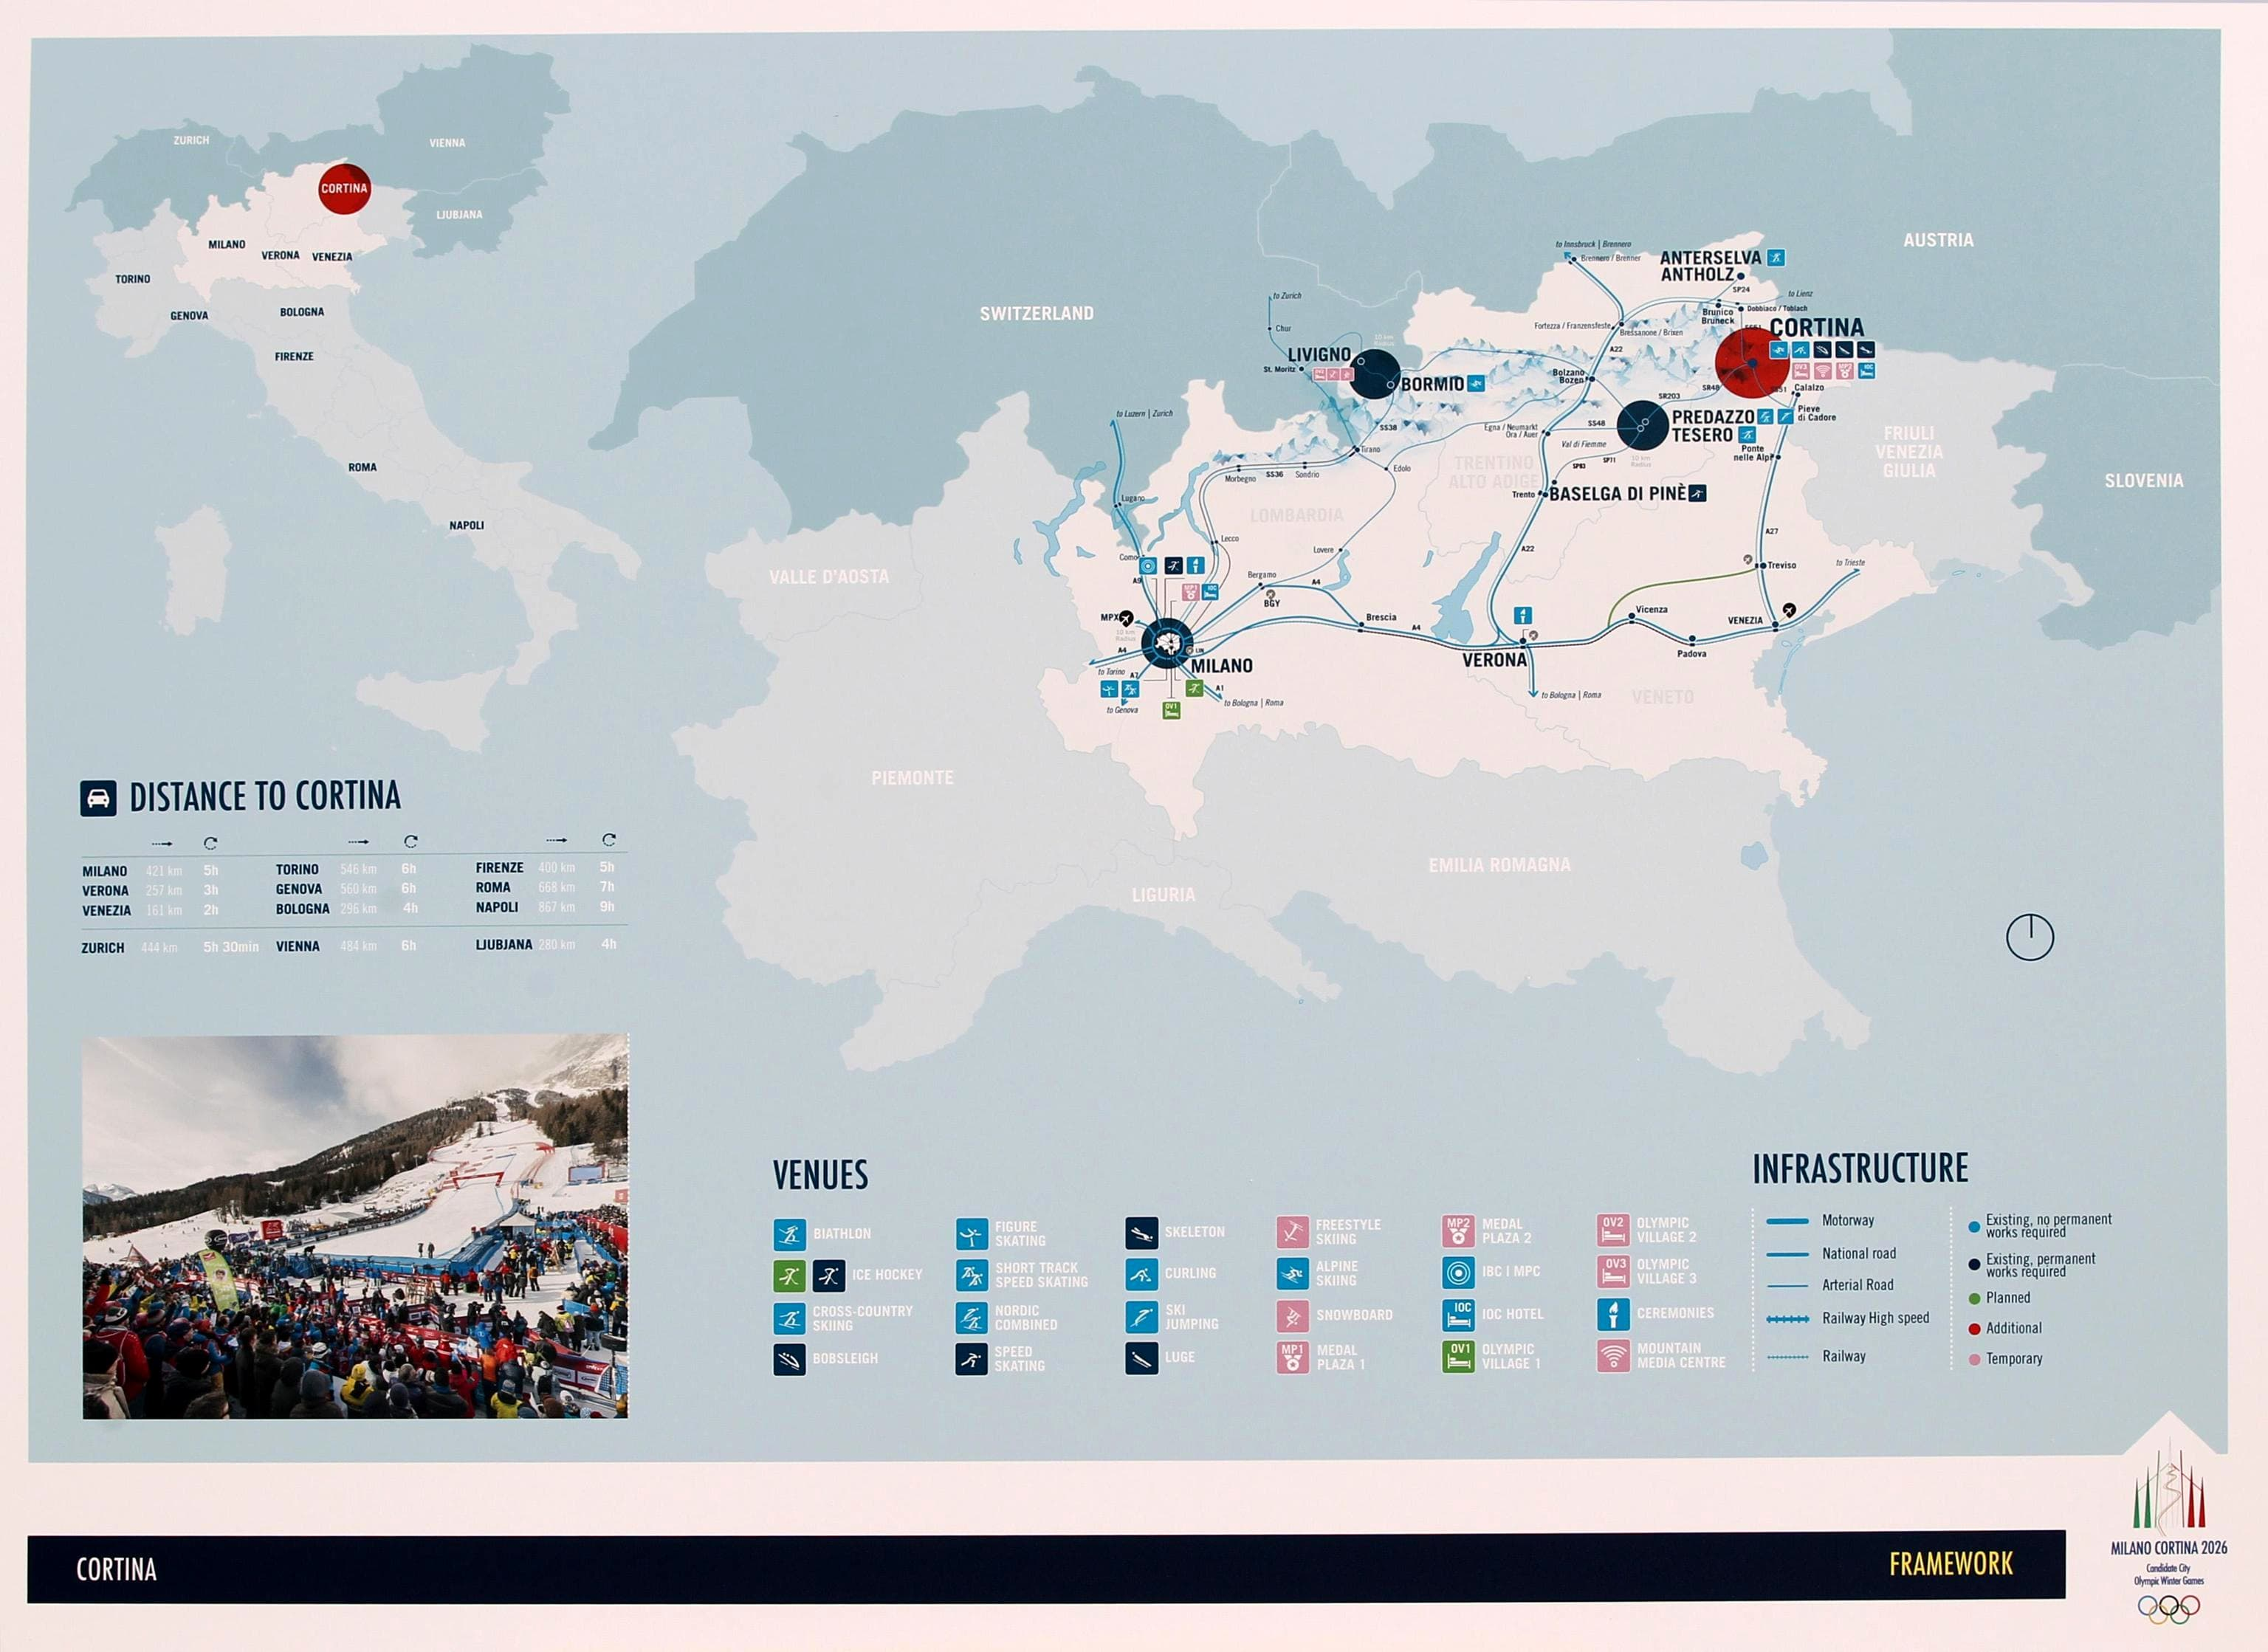 olimpiadi-italia-2026-infografica-ansa-2